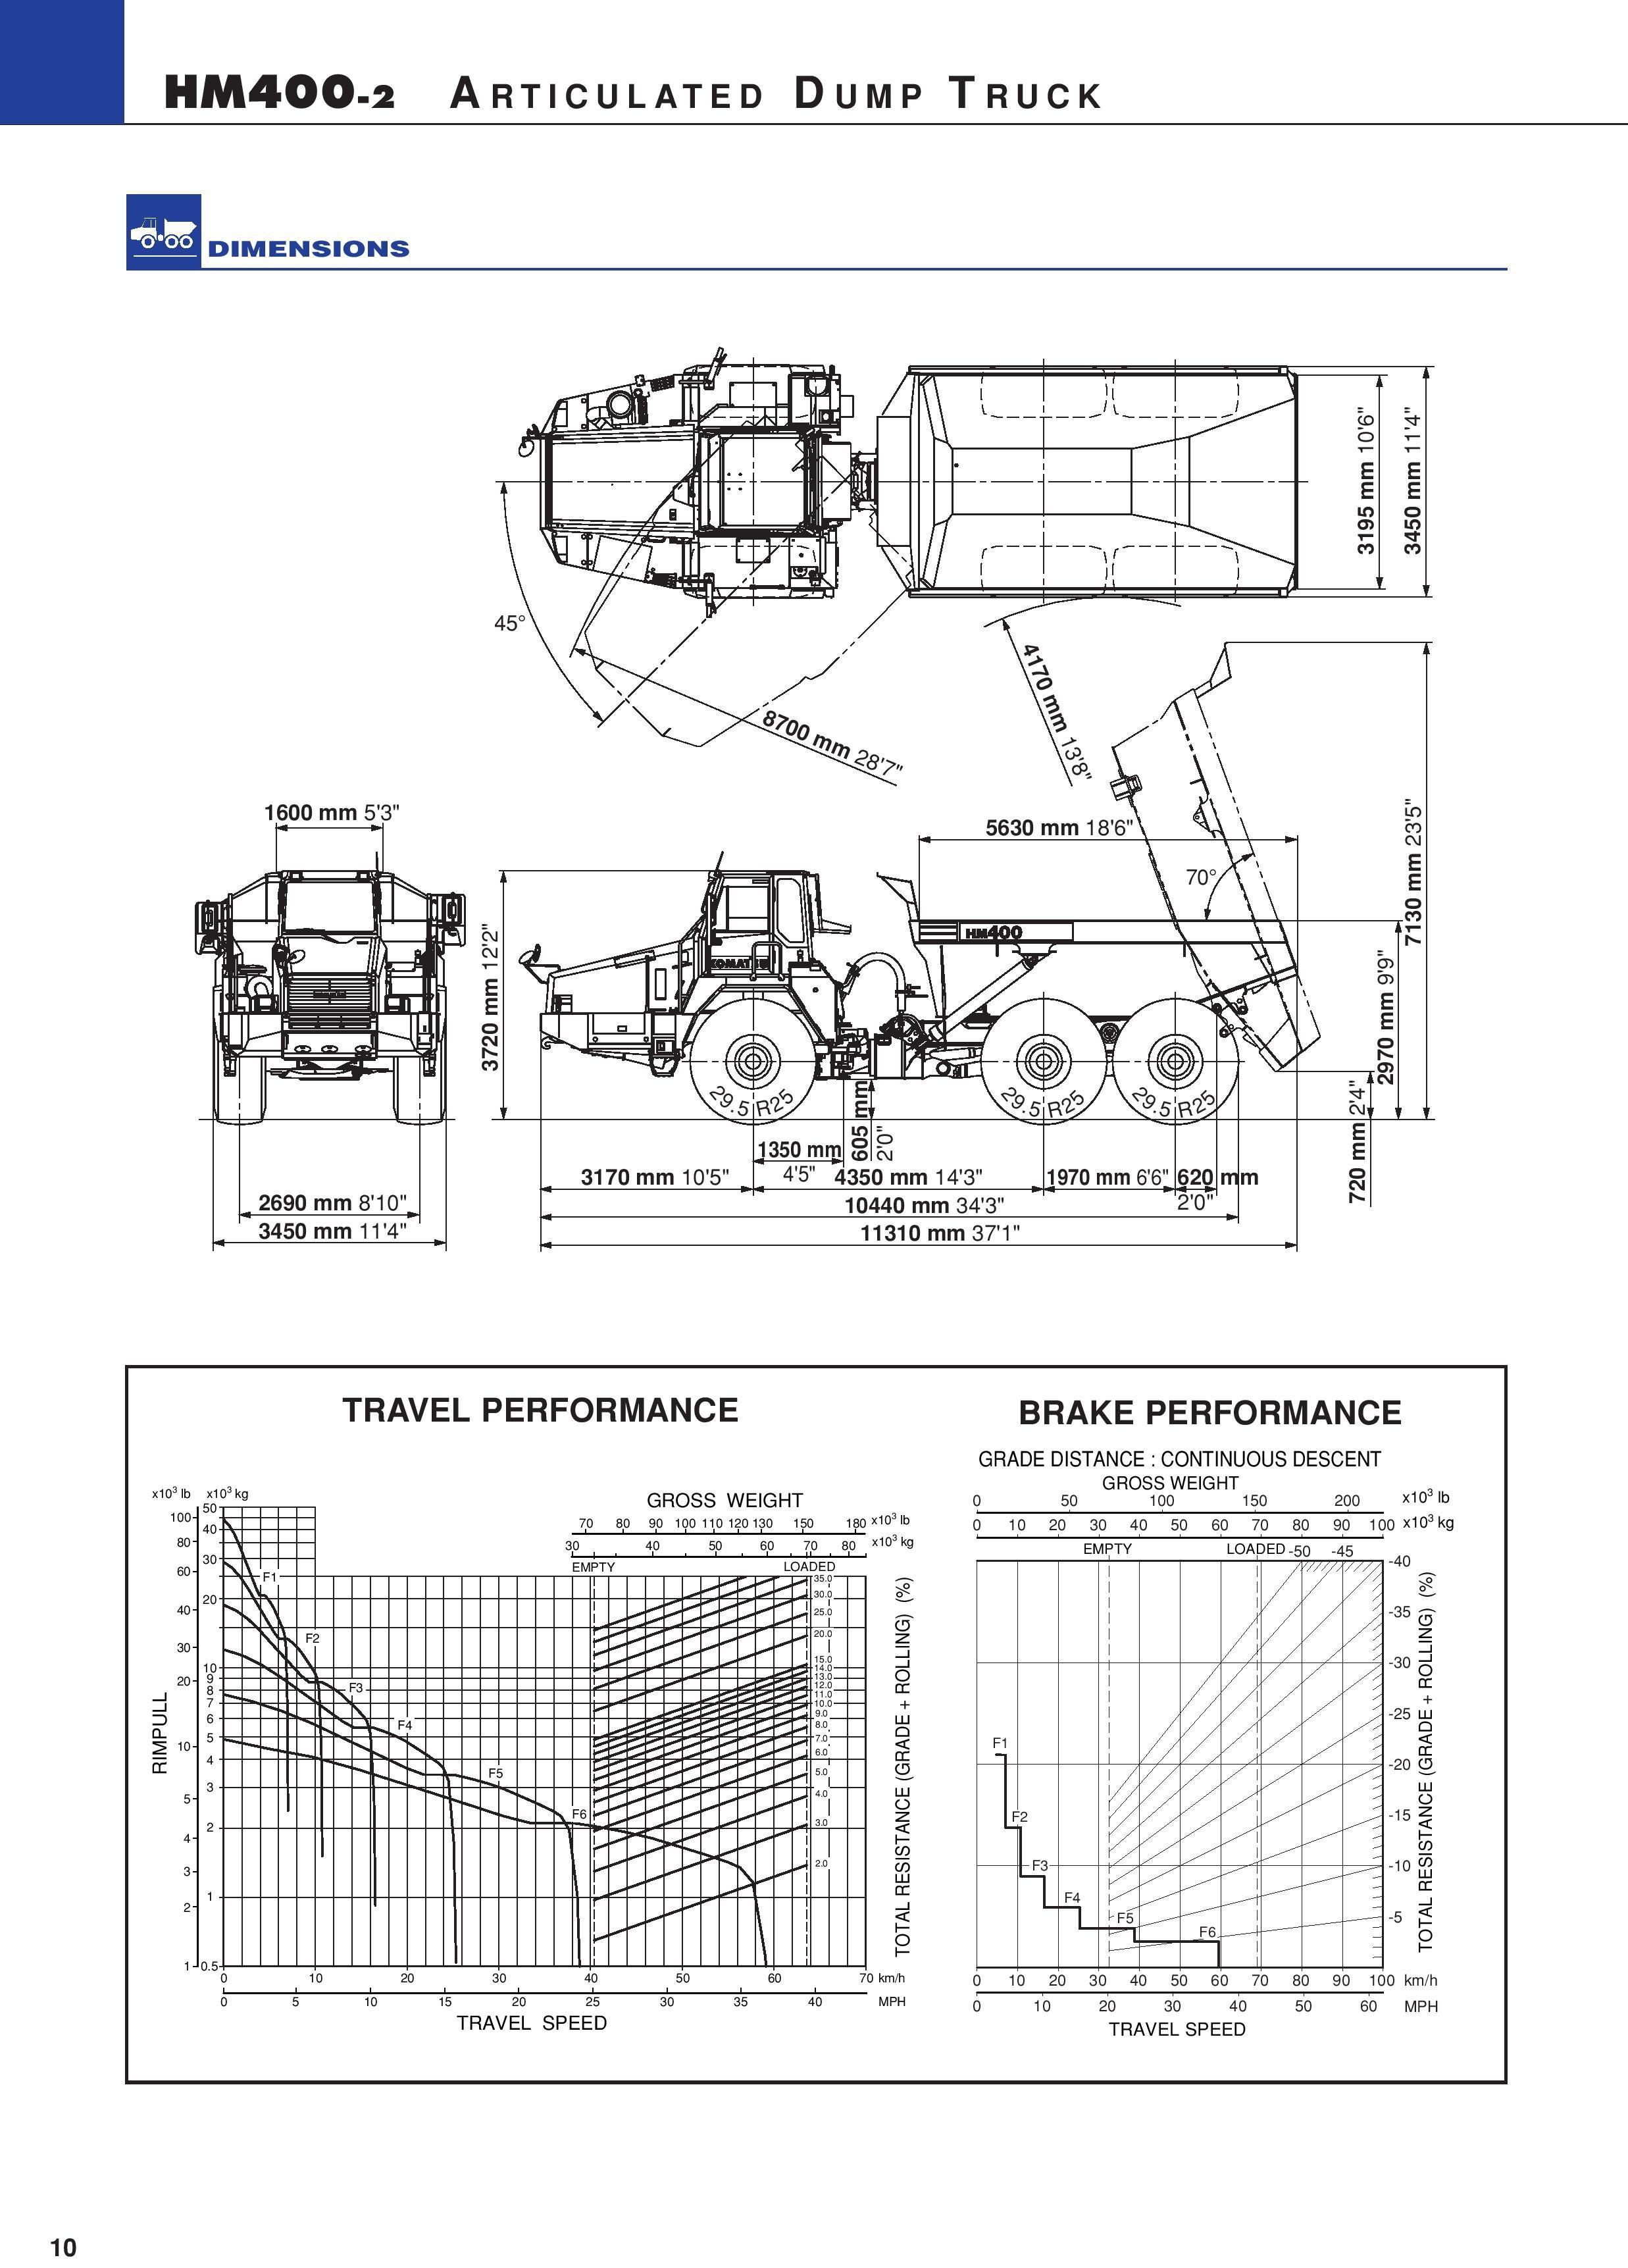 Used Dump Trucks >> Komatsu Articulated Dump Truck Supplier Worldwide   Used ...